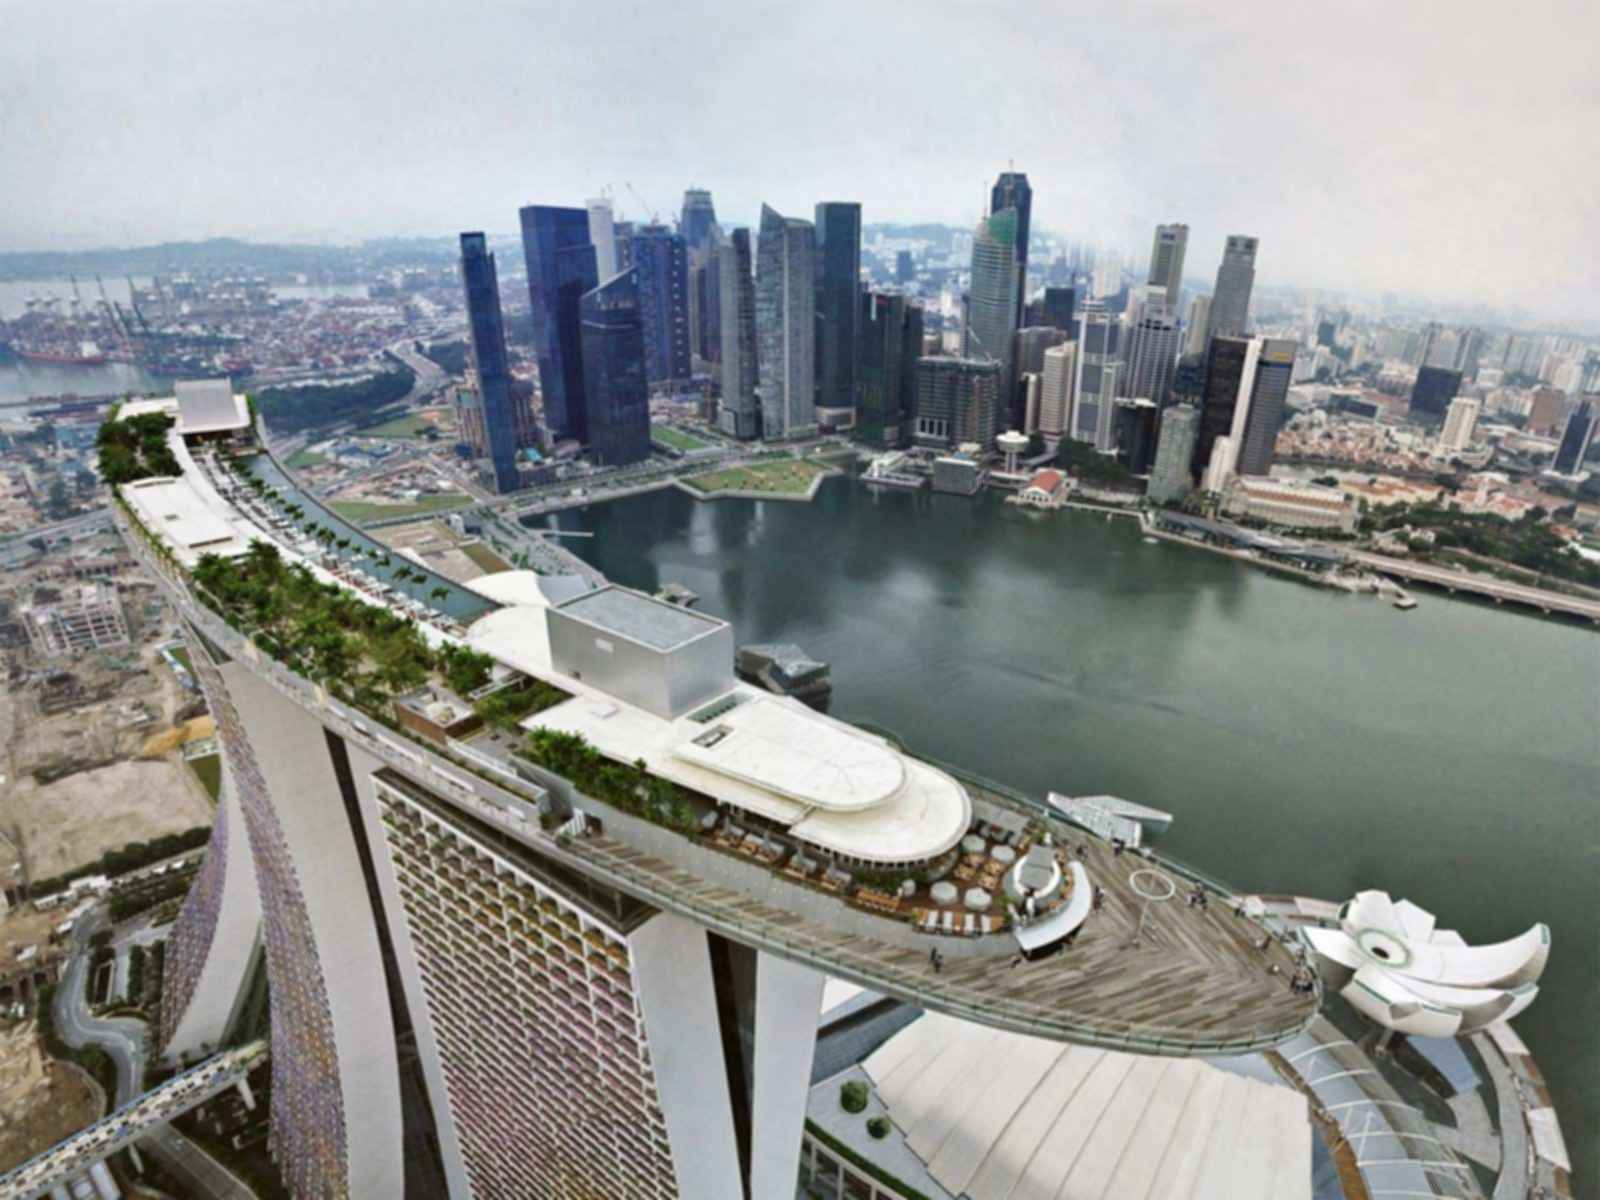 Marina Bay Sands Skypark - View of the Skypark